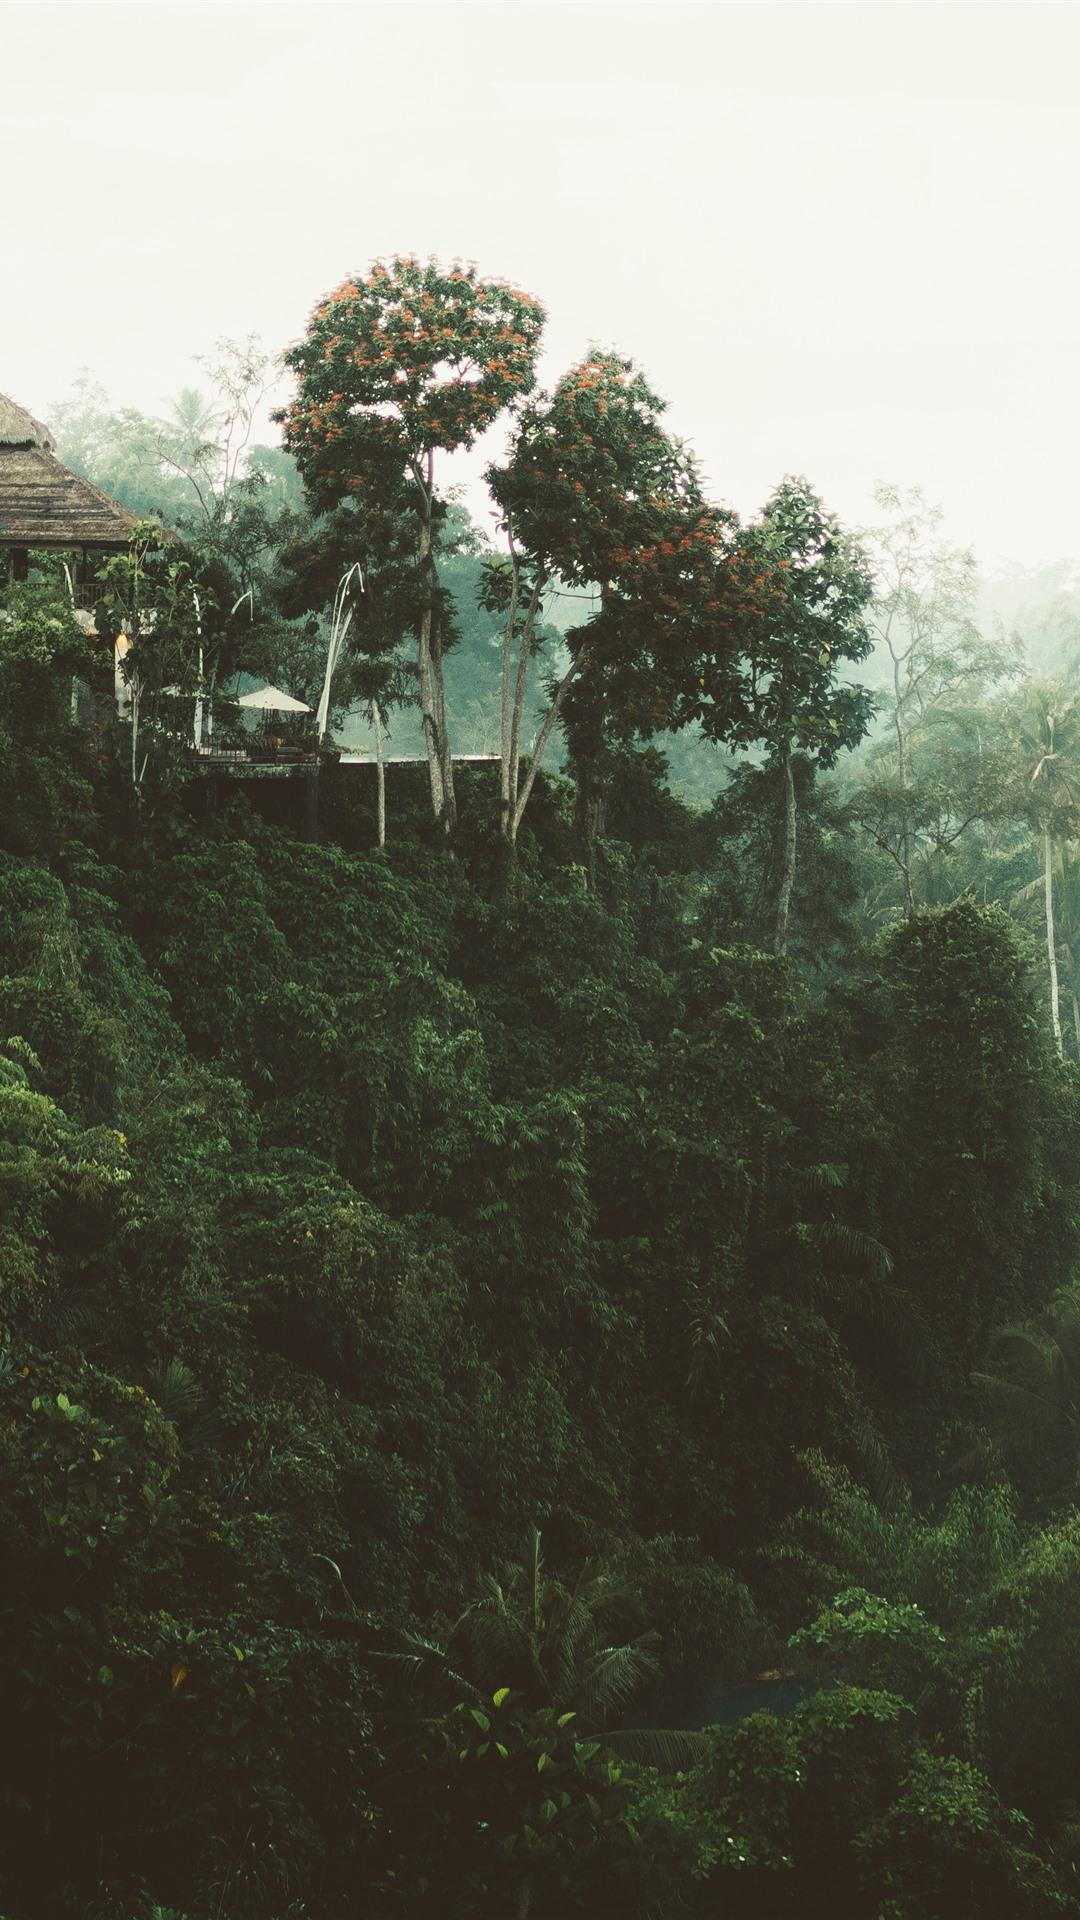 Jungle, trees, house 1242x2688 iPhone ...